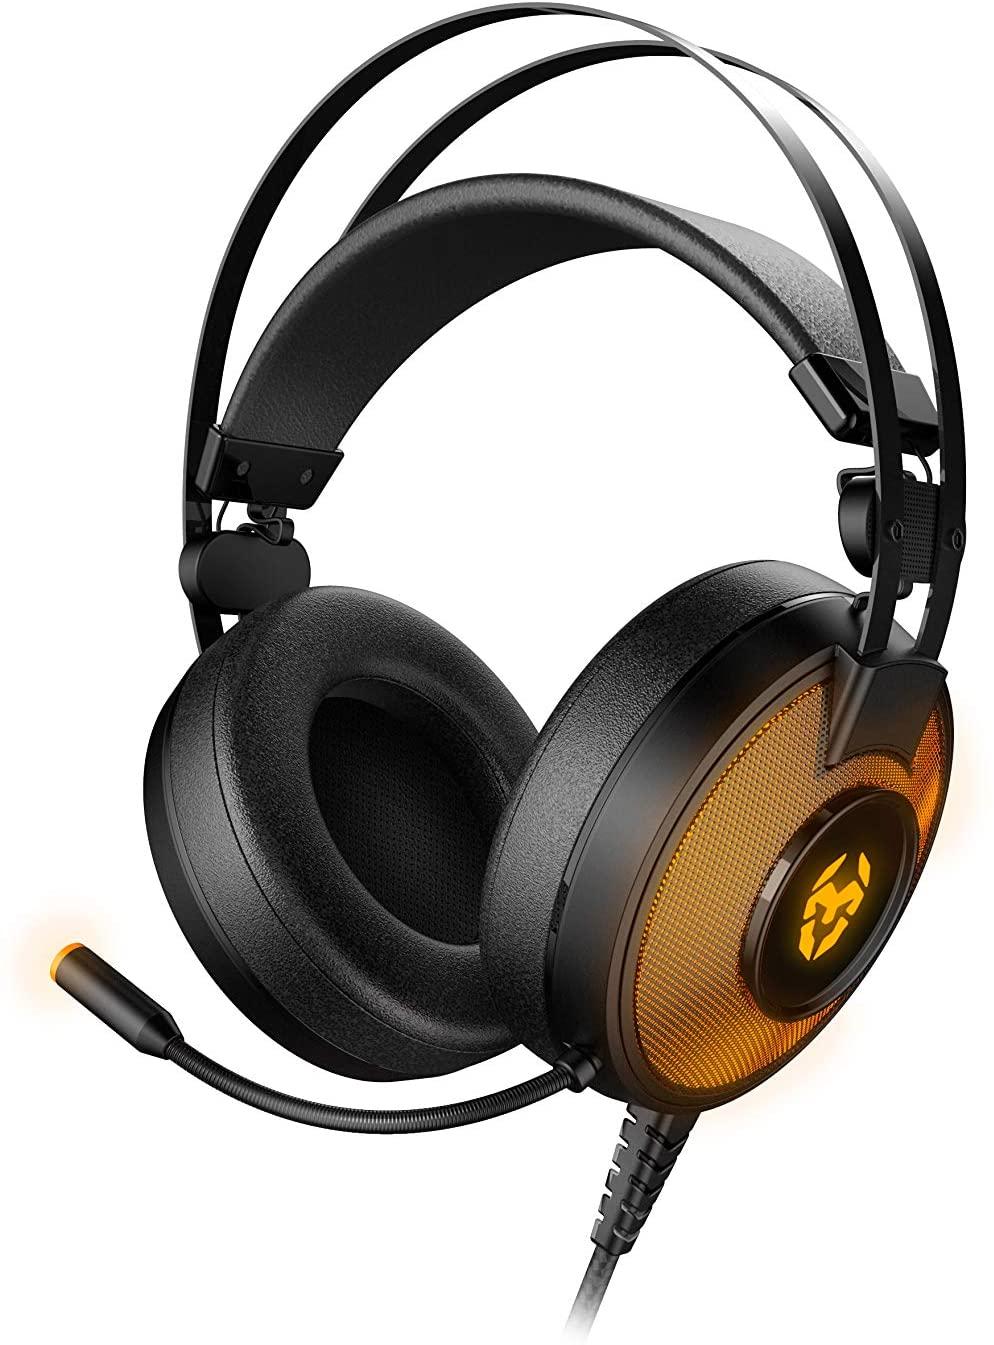 Auriculares KROM RGB sonido 7.1 solo 12.6€